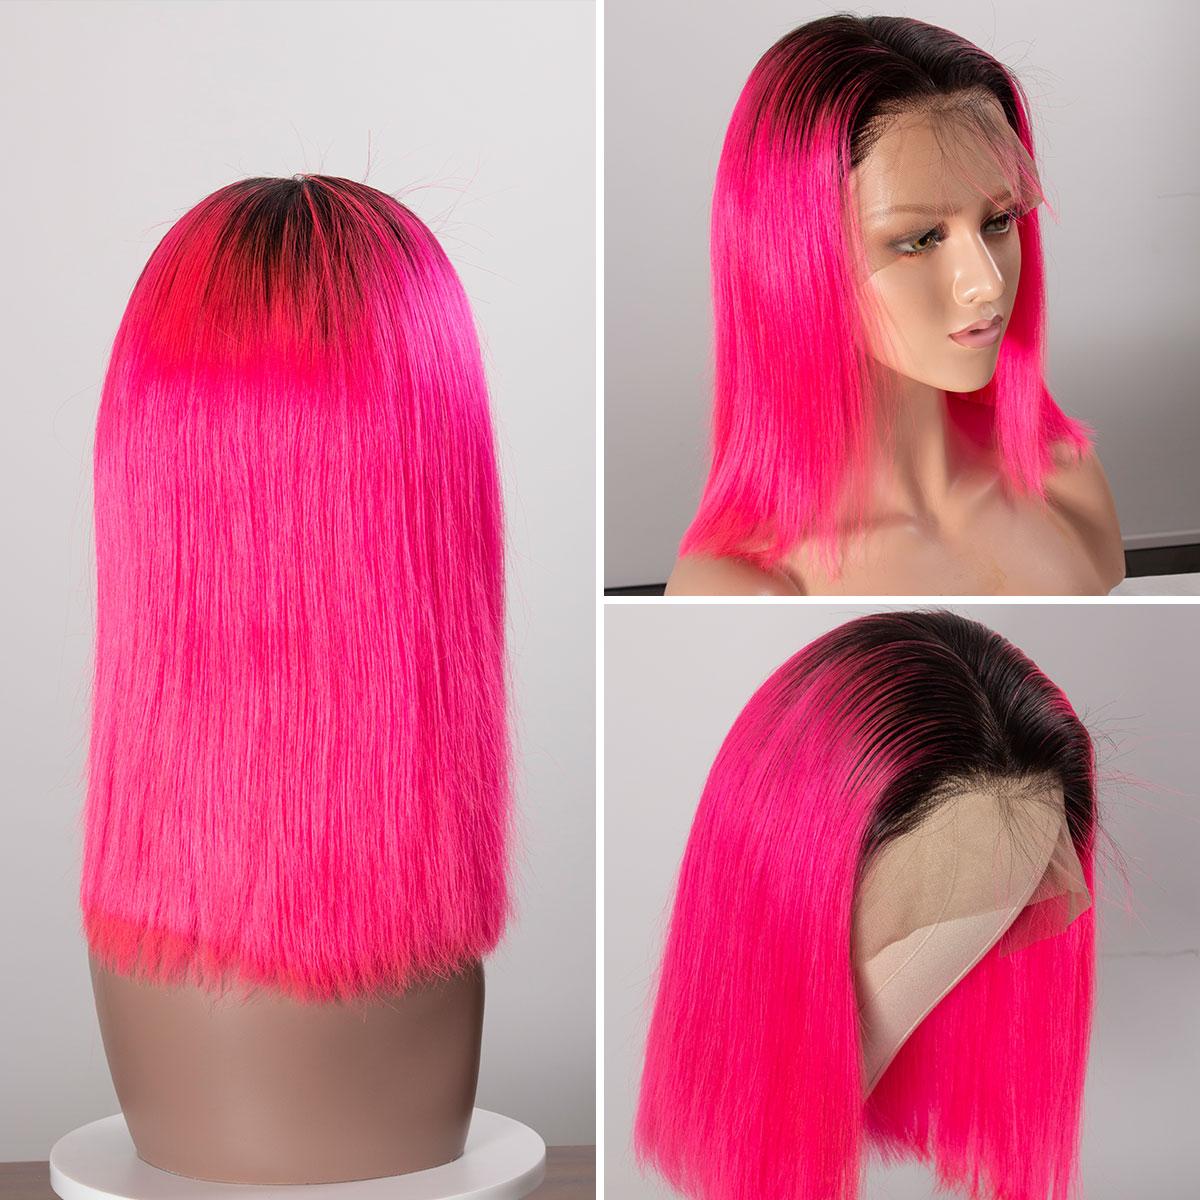 Colorful 13x6 Short Bob Straight Hair - 1B/Pink